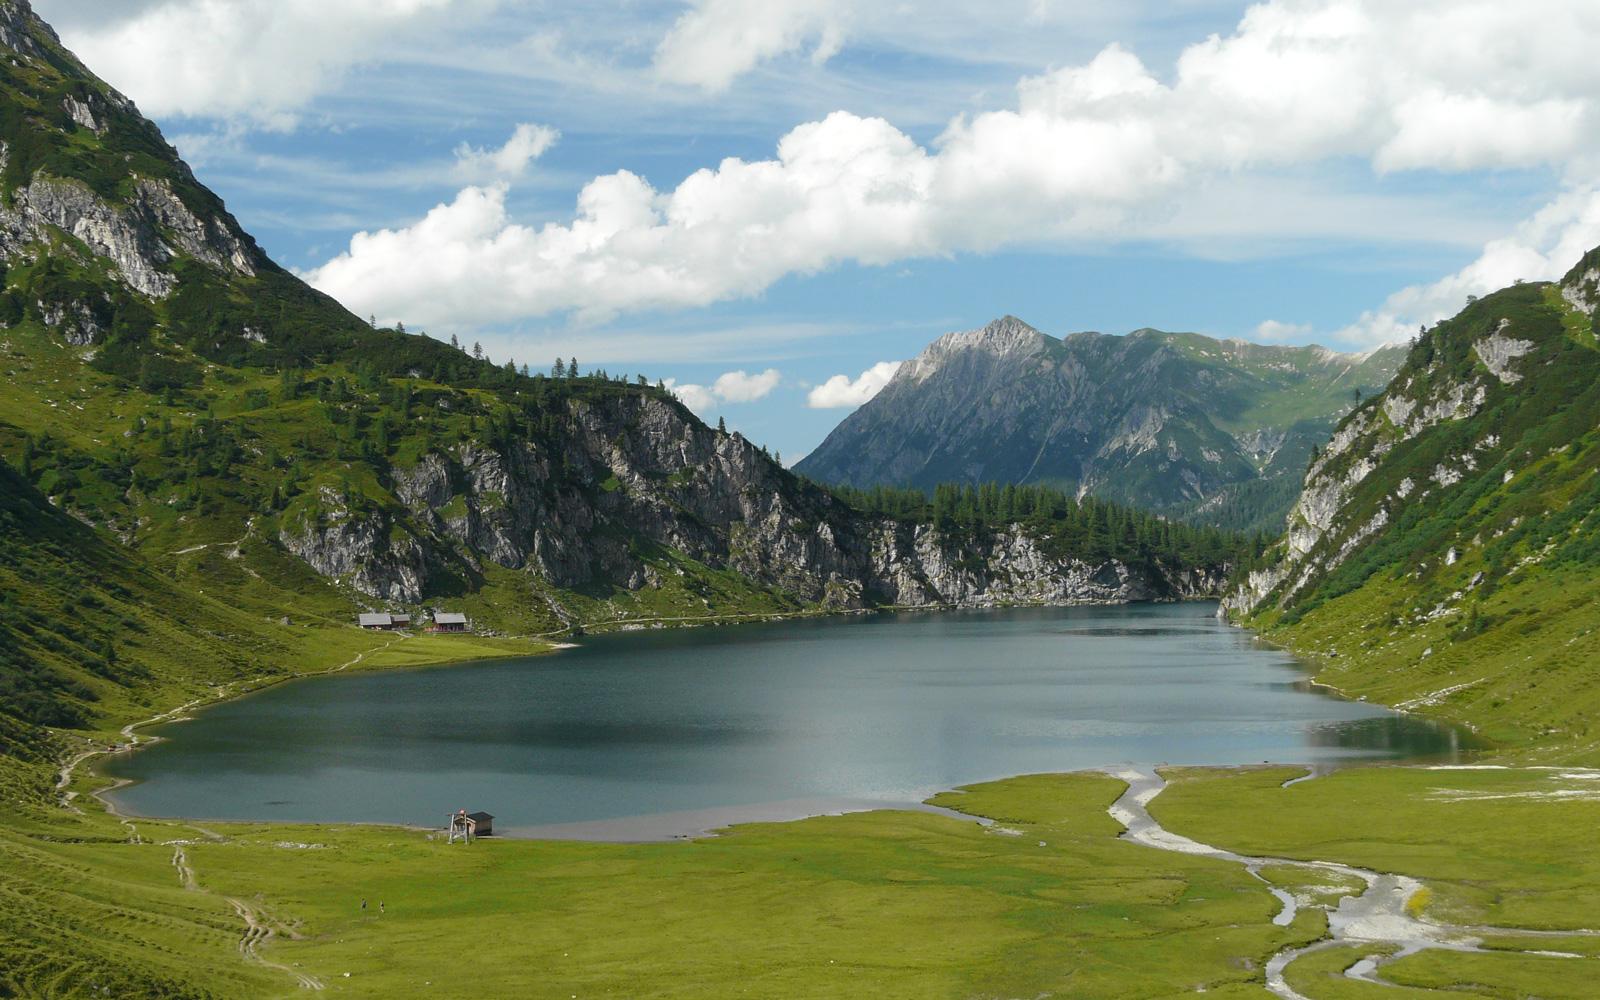 Naturerlebnis in Salzburg: Tappenkarsee